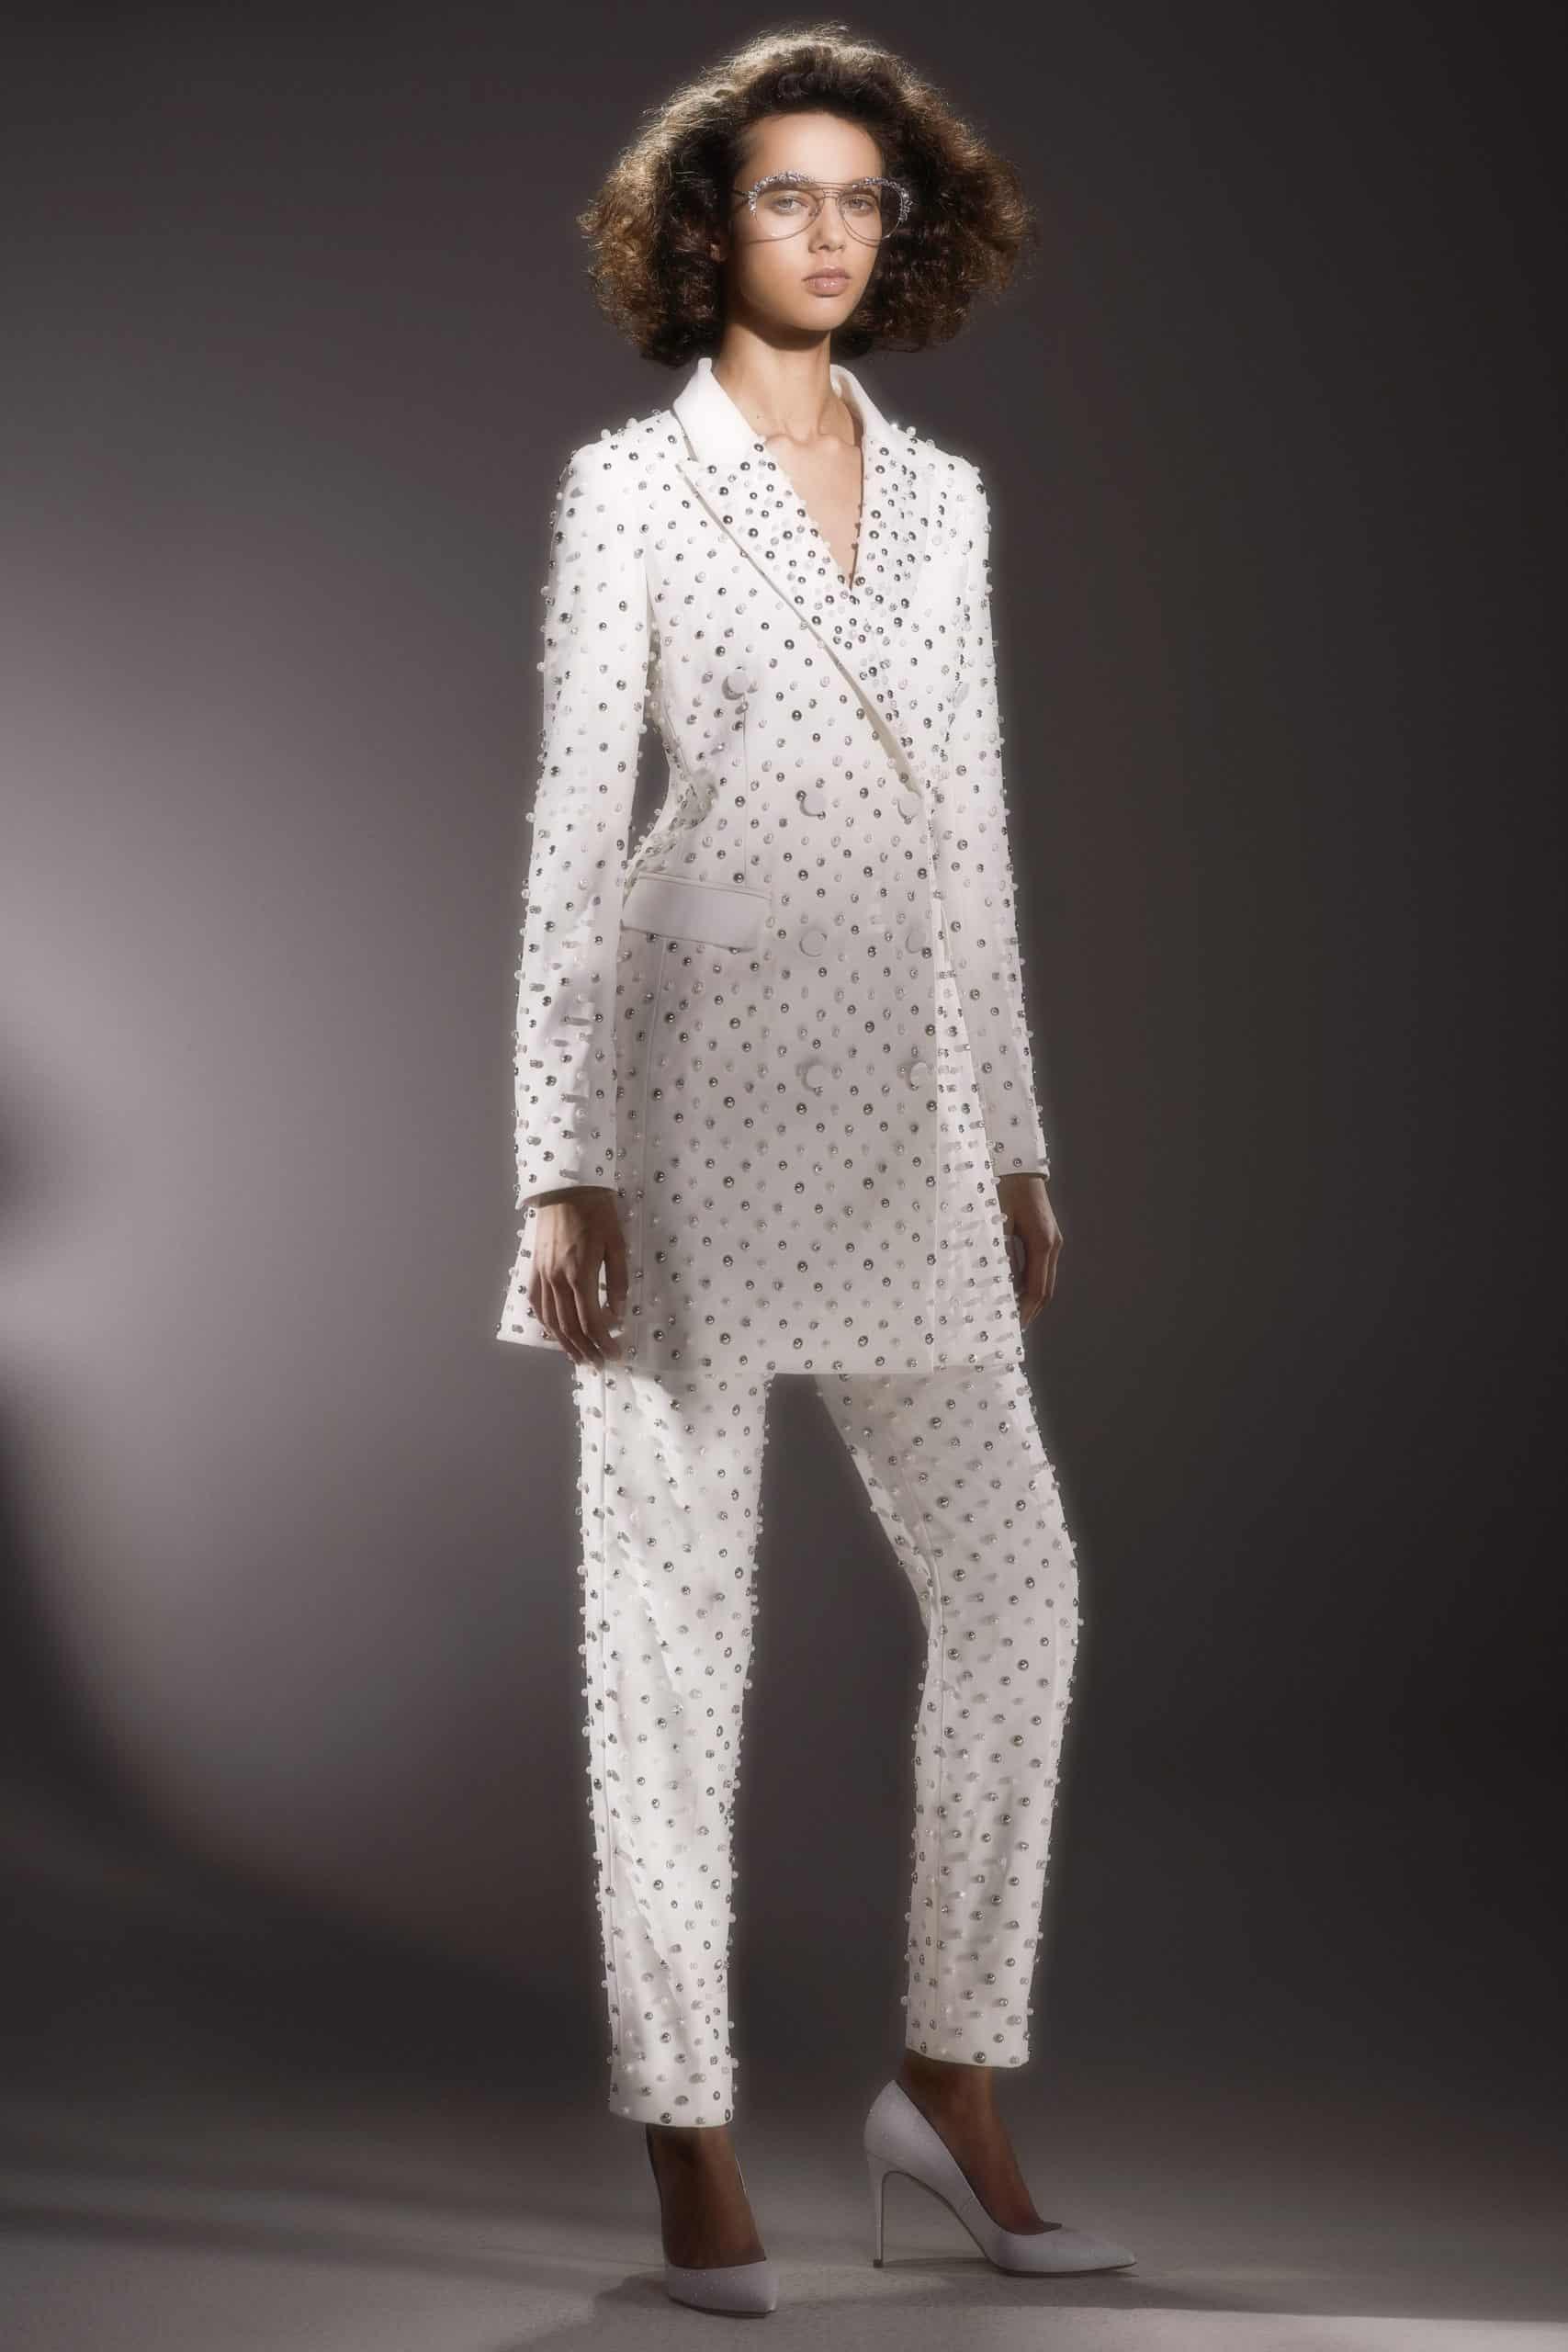 wedding suit with perals